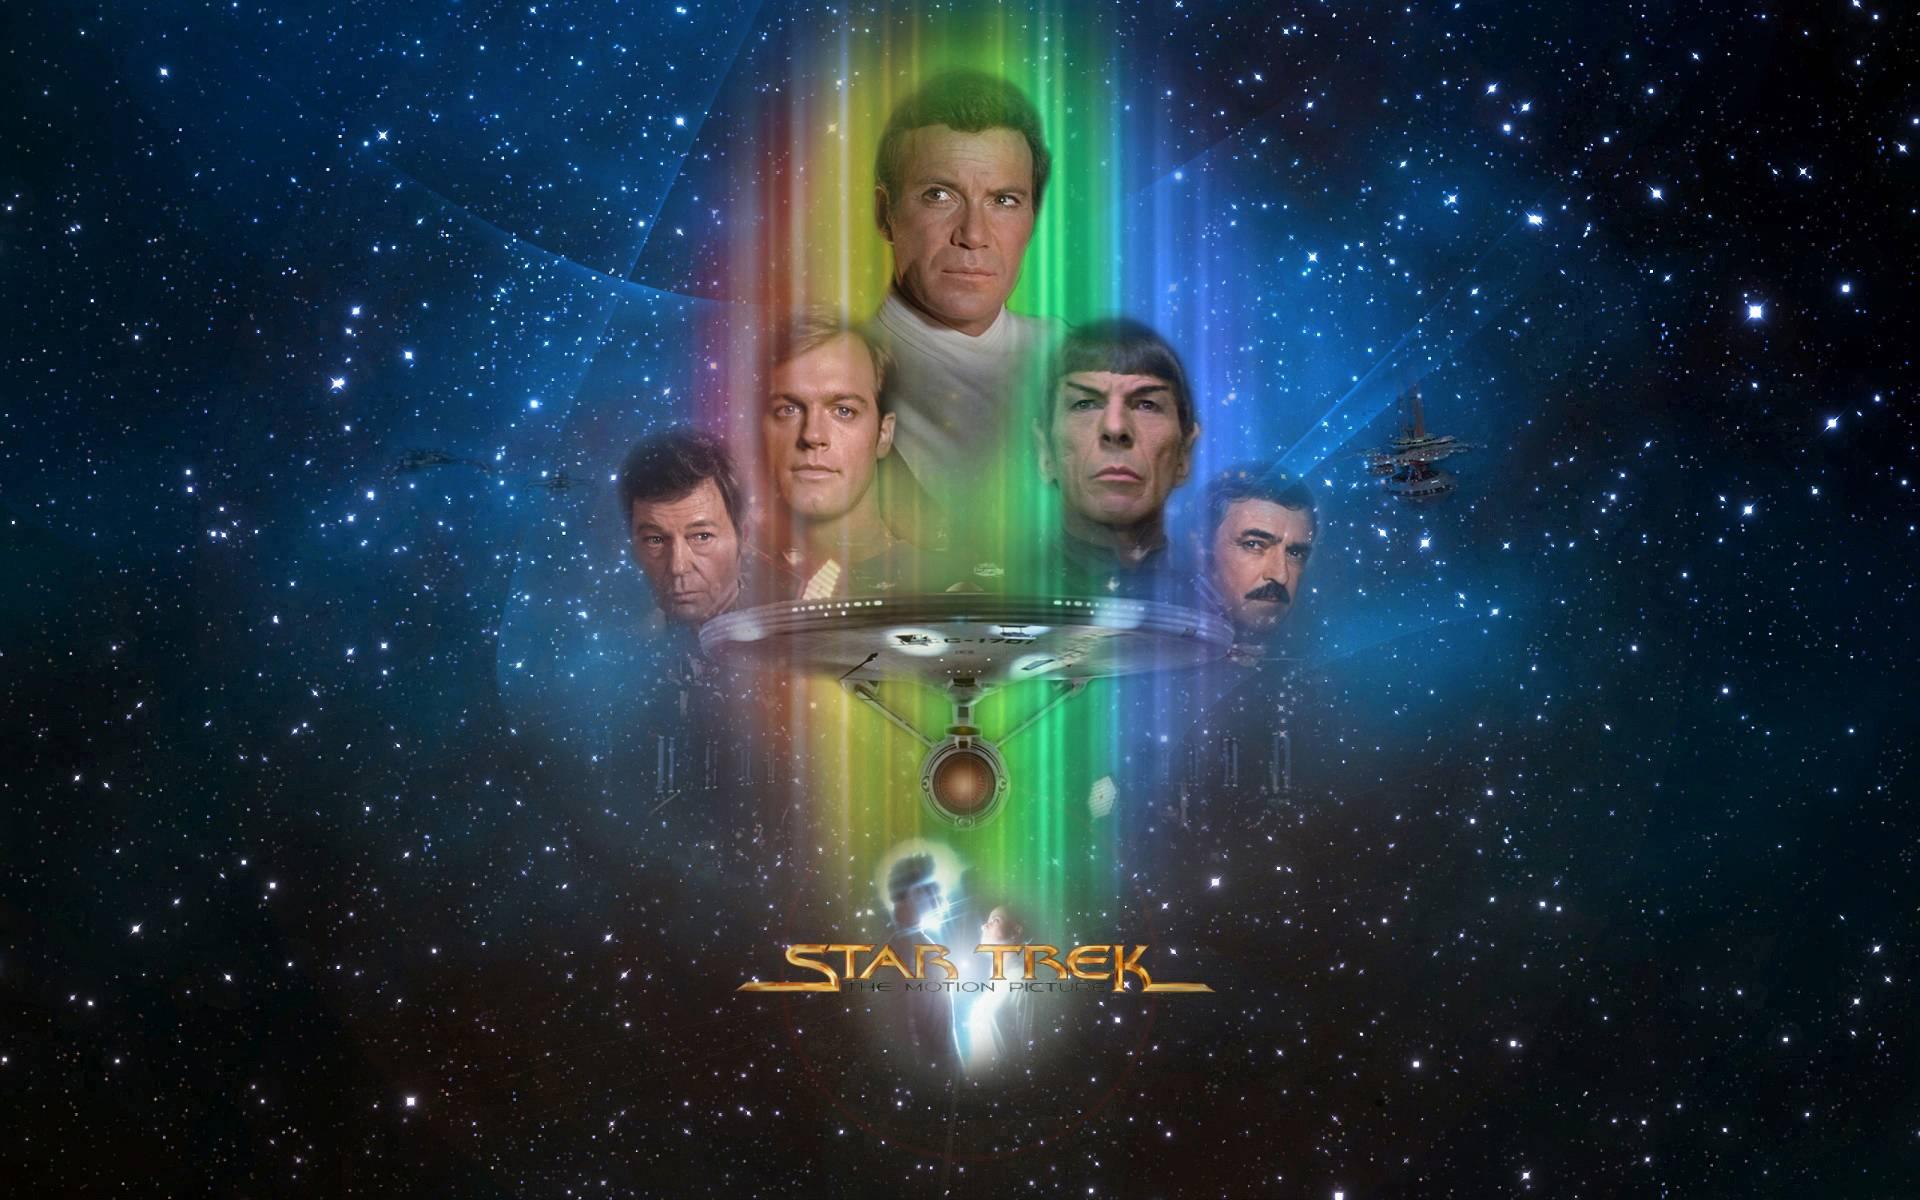 Star Trek Wallpapers For Iphone